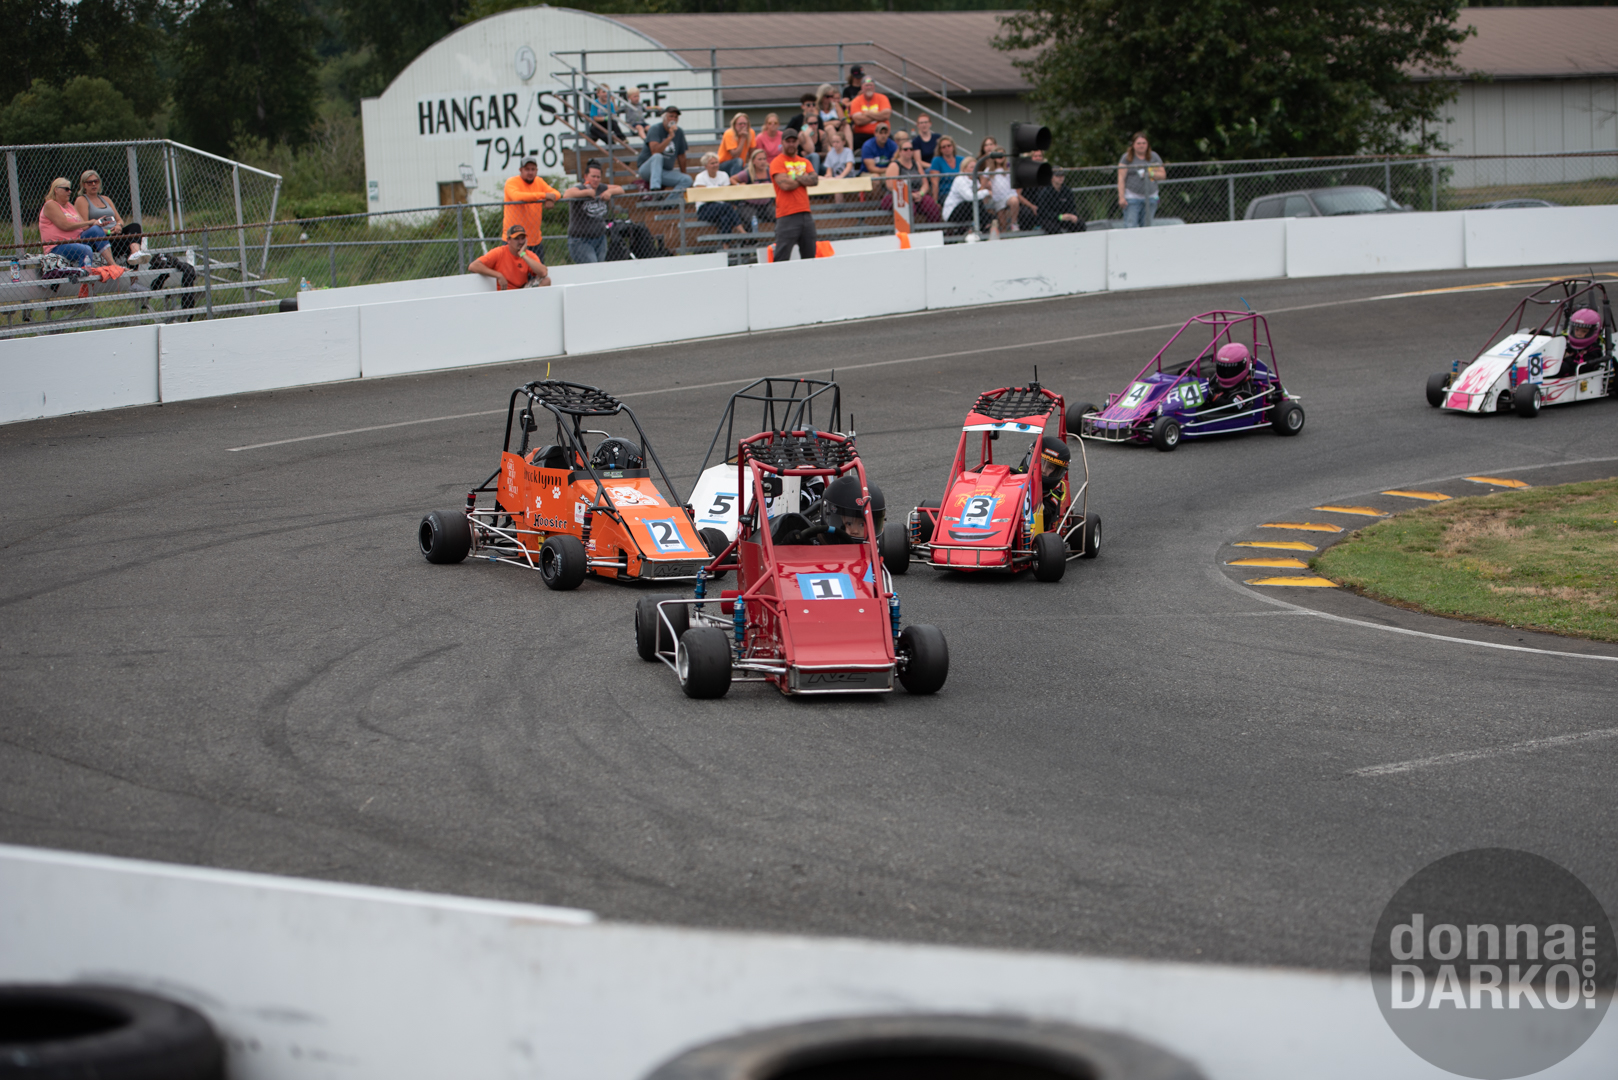 QWMA (Racing) 8-11-2019 DSC_7986.jpg